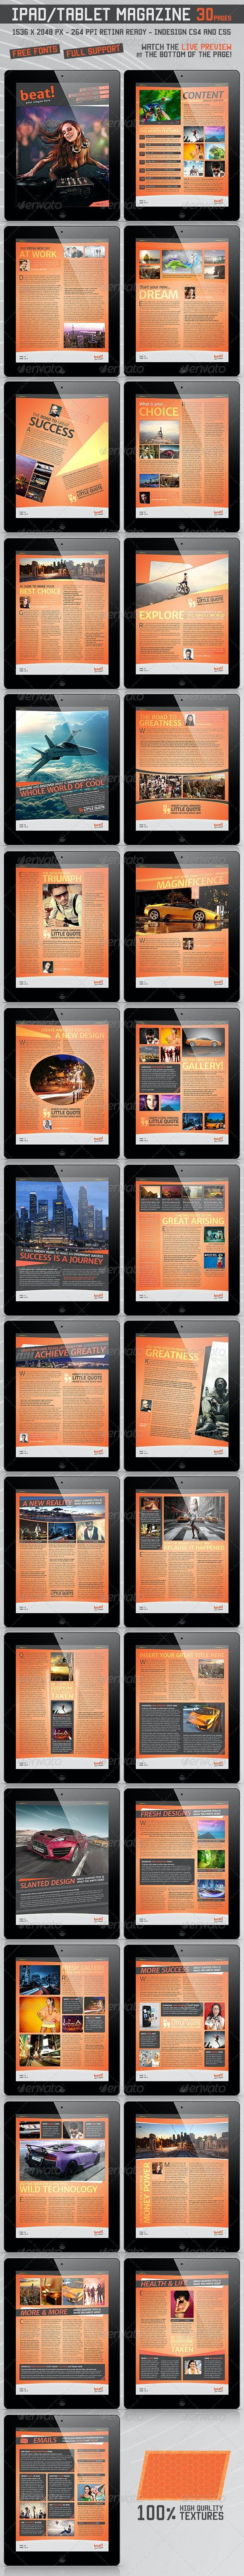 Tablet Retina Magazine Template v.2 30 Pages  - Digital Magazines ePublishing